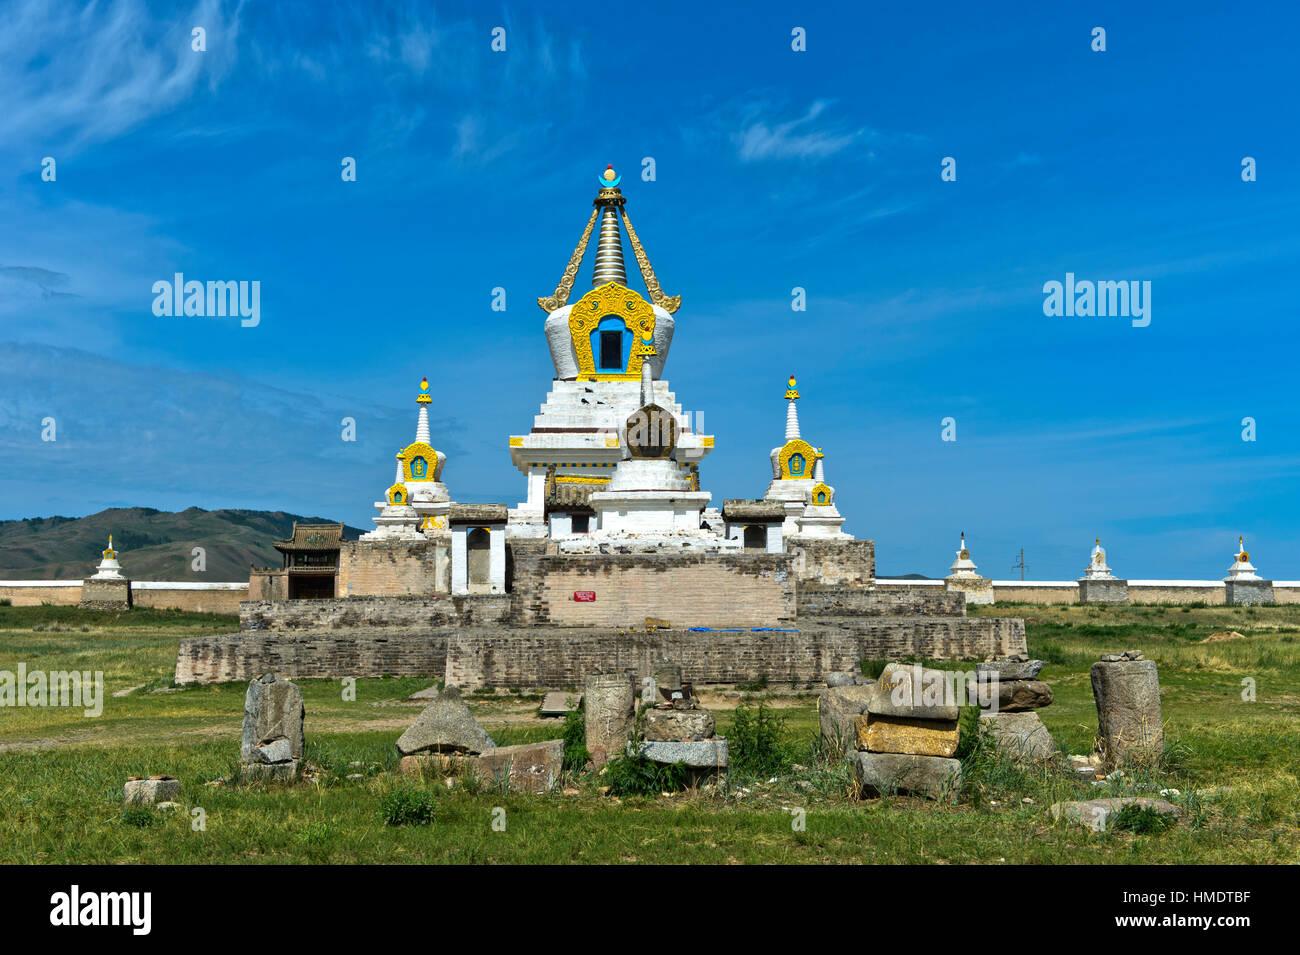 Stupa und Tempel, Kloster Erdene Zuu Chiid, Karakorum, Kharkhorin, Övörkhangai Aimak, Mongolei Stockbild